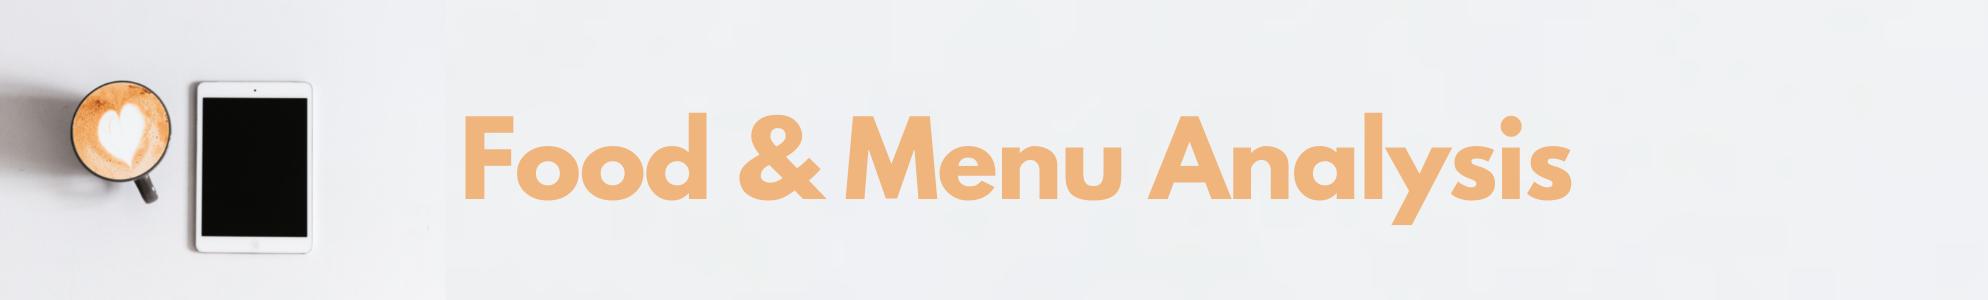 Food and Menu Analysis Banner